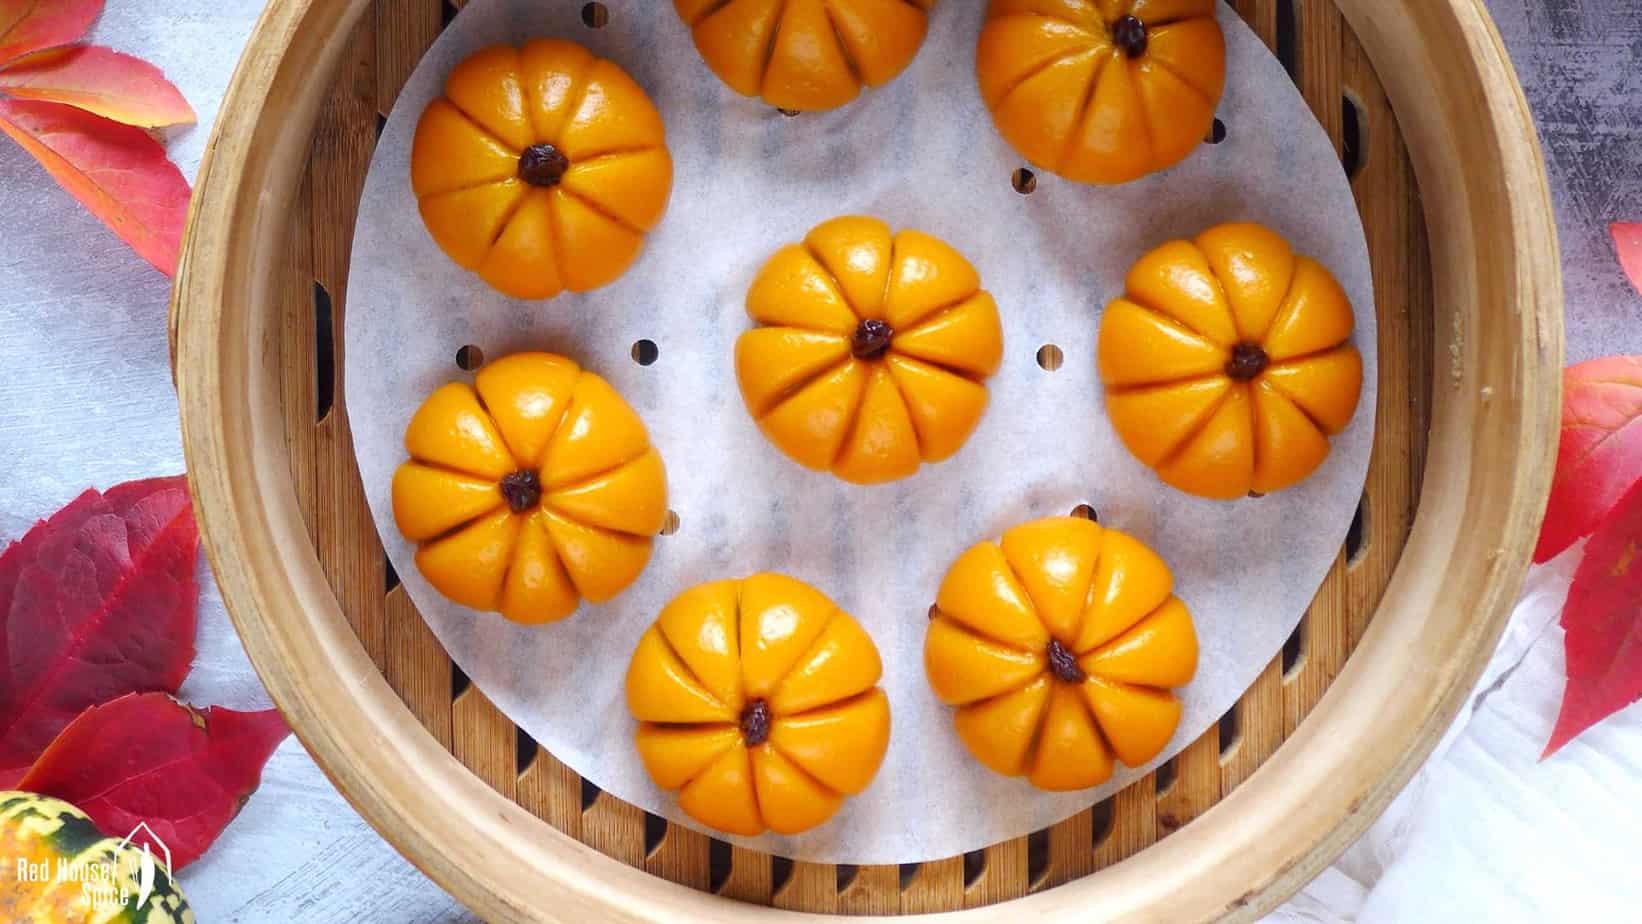 pumpkin shaped mochi cakes in a steamer.